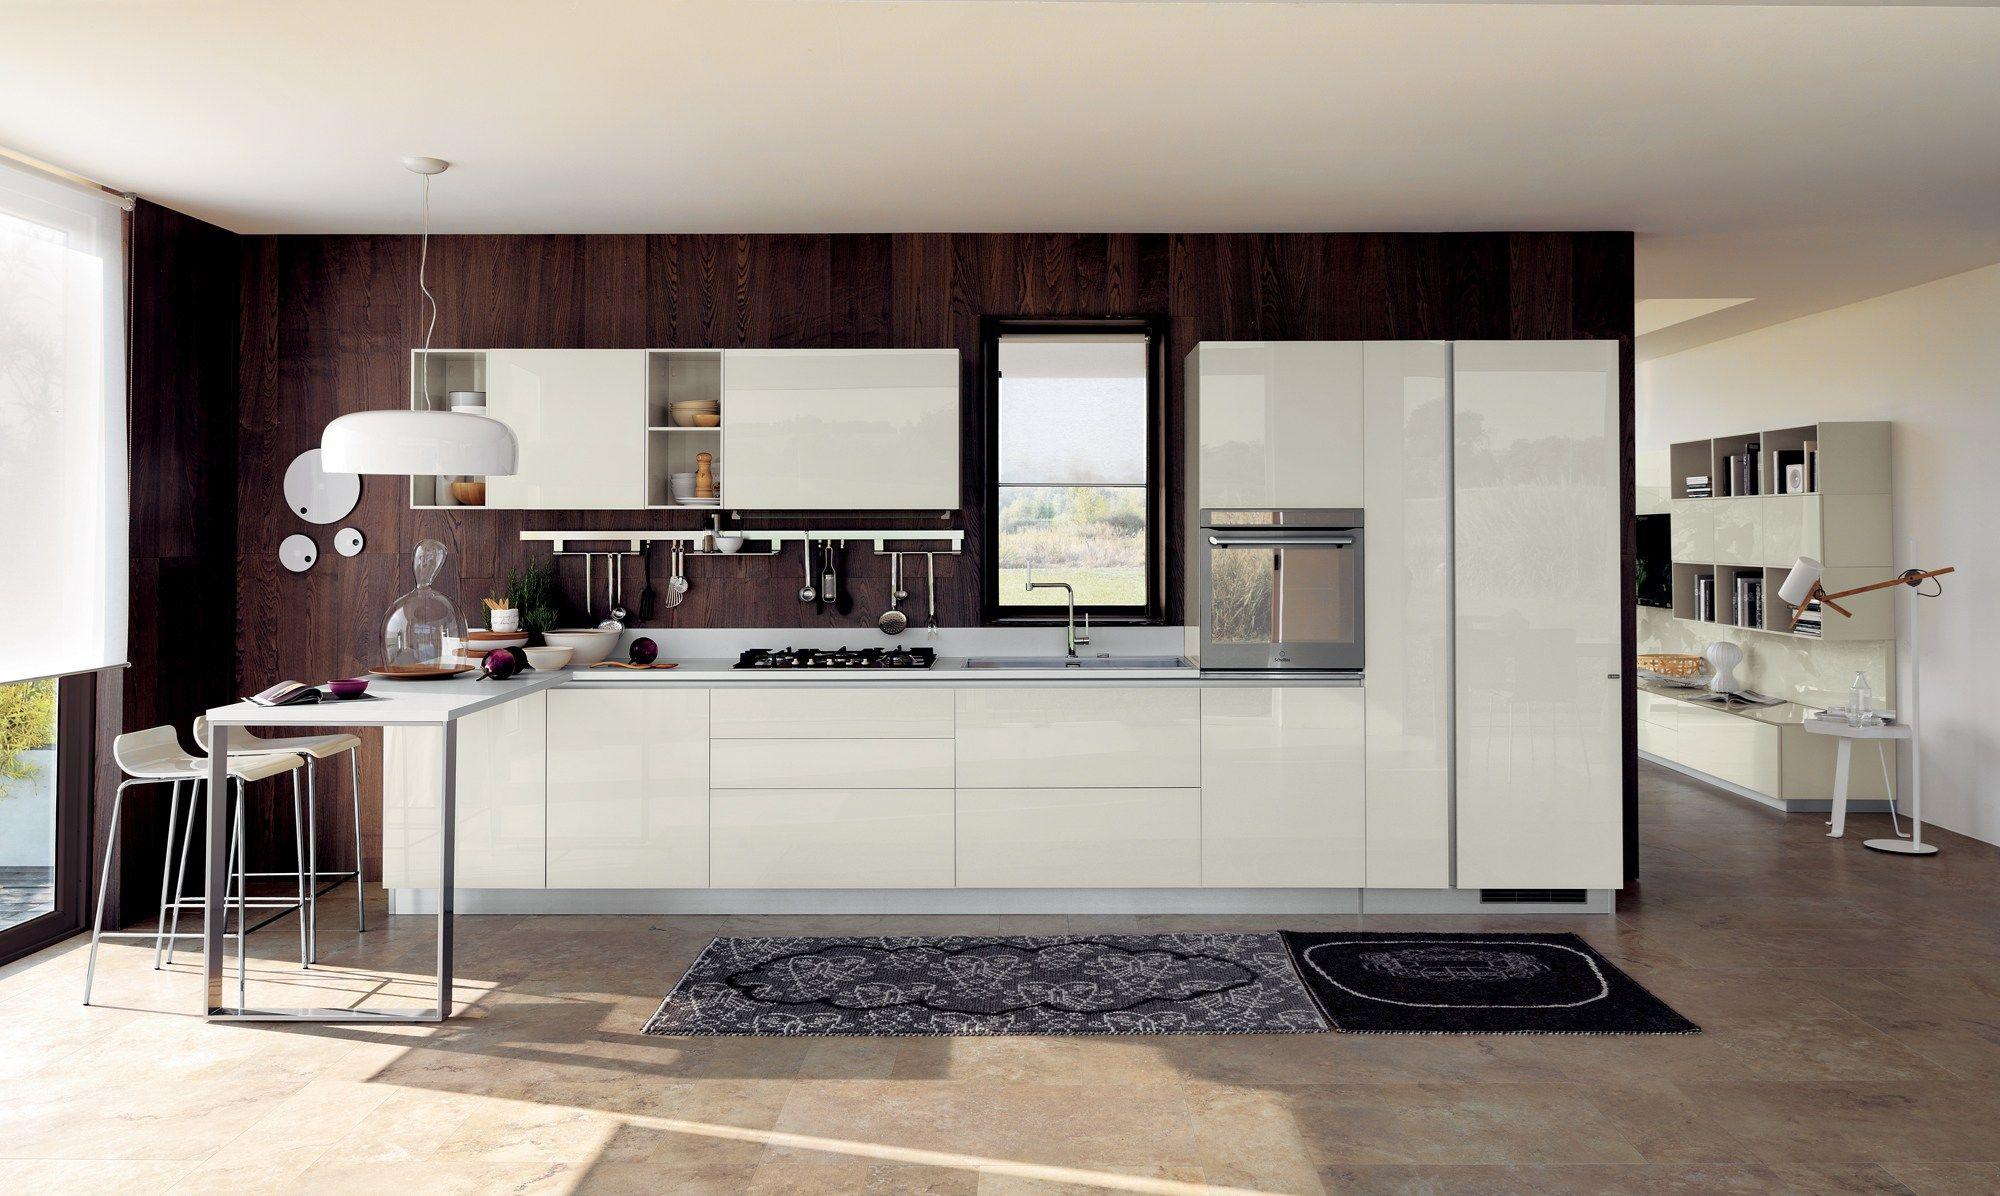 Cuisine int gr e liberamente ligne scavolini by scavolini design vuesse design for Cuisine integree